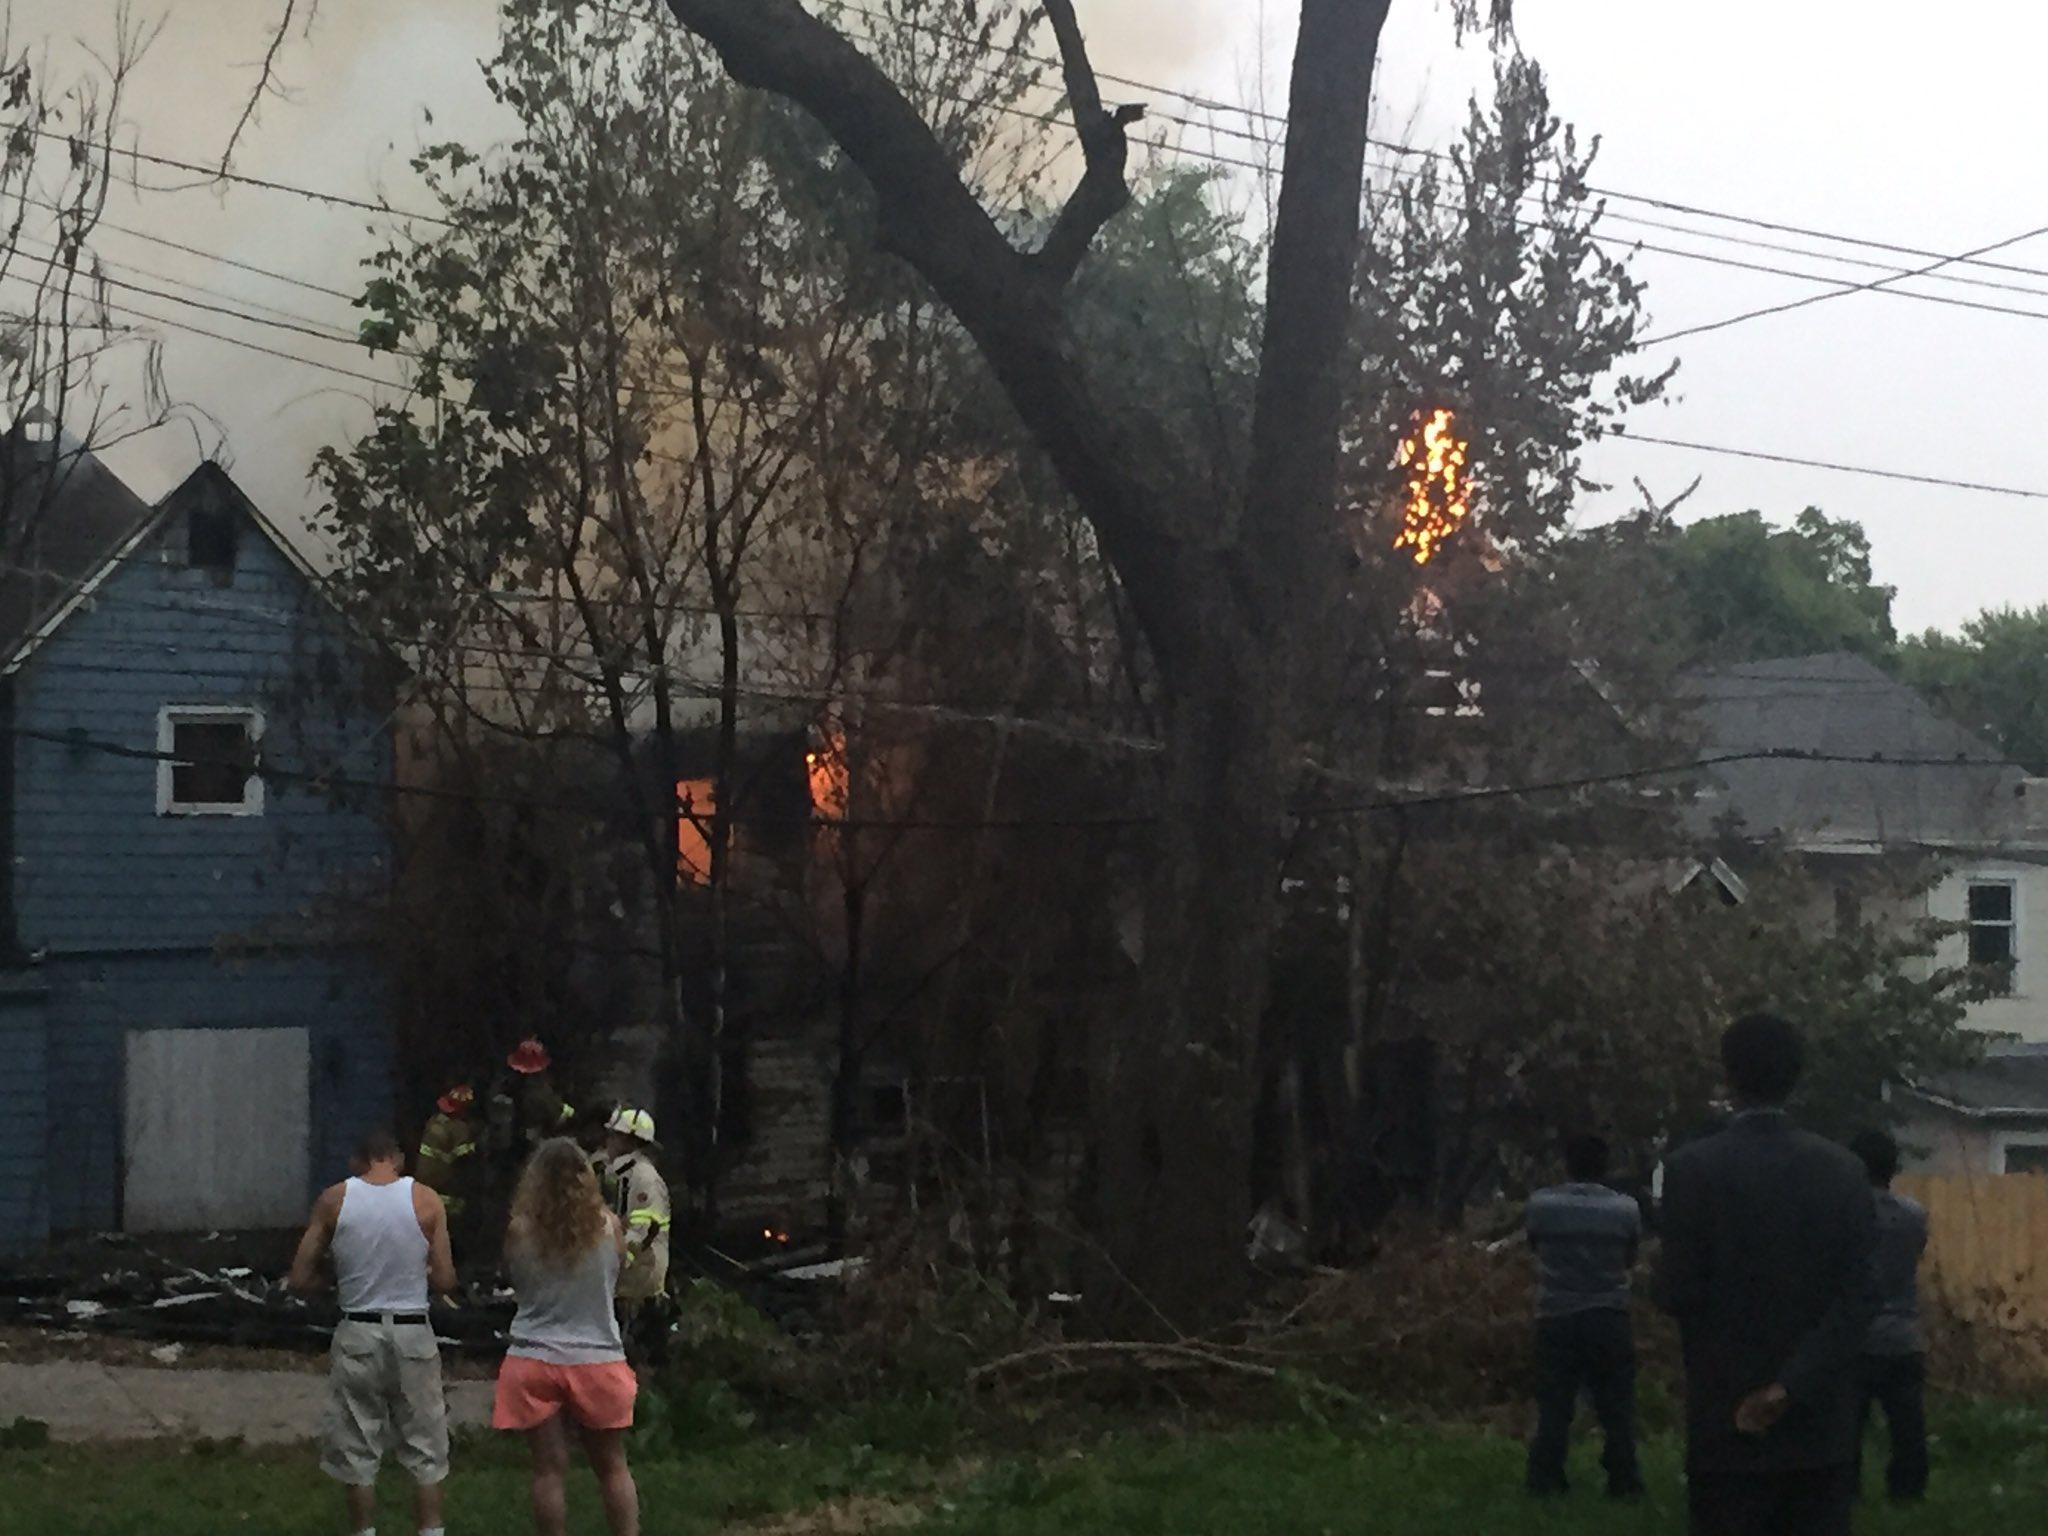 KCK firefighters battle a house fire in the 700 block of Orville. (KCTV5)